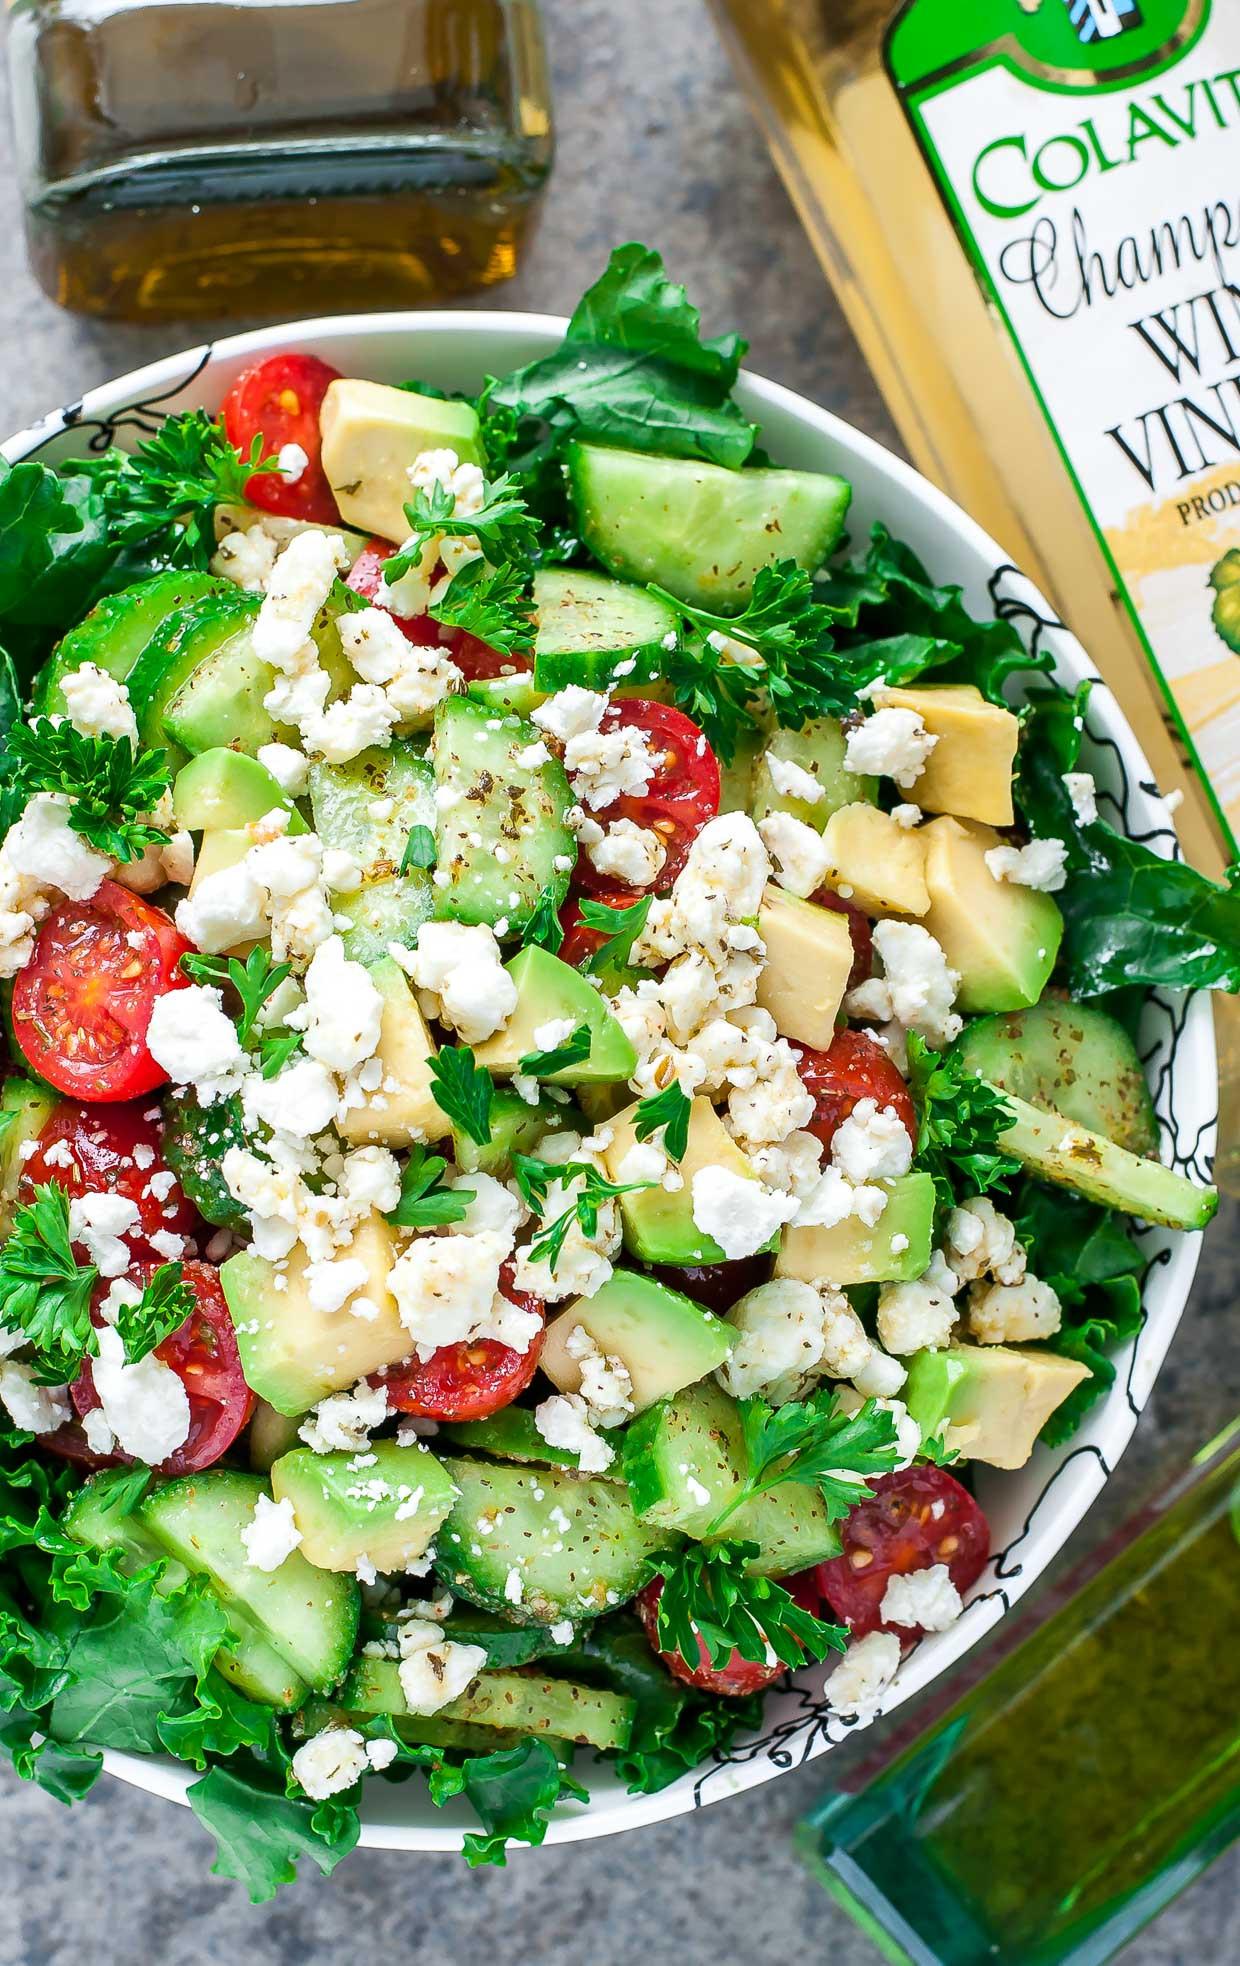 Kale Recipes Easy Healthy  Greek Kale Salad Recipe with Easy Homemade Greek Dressing